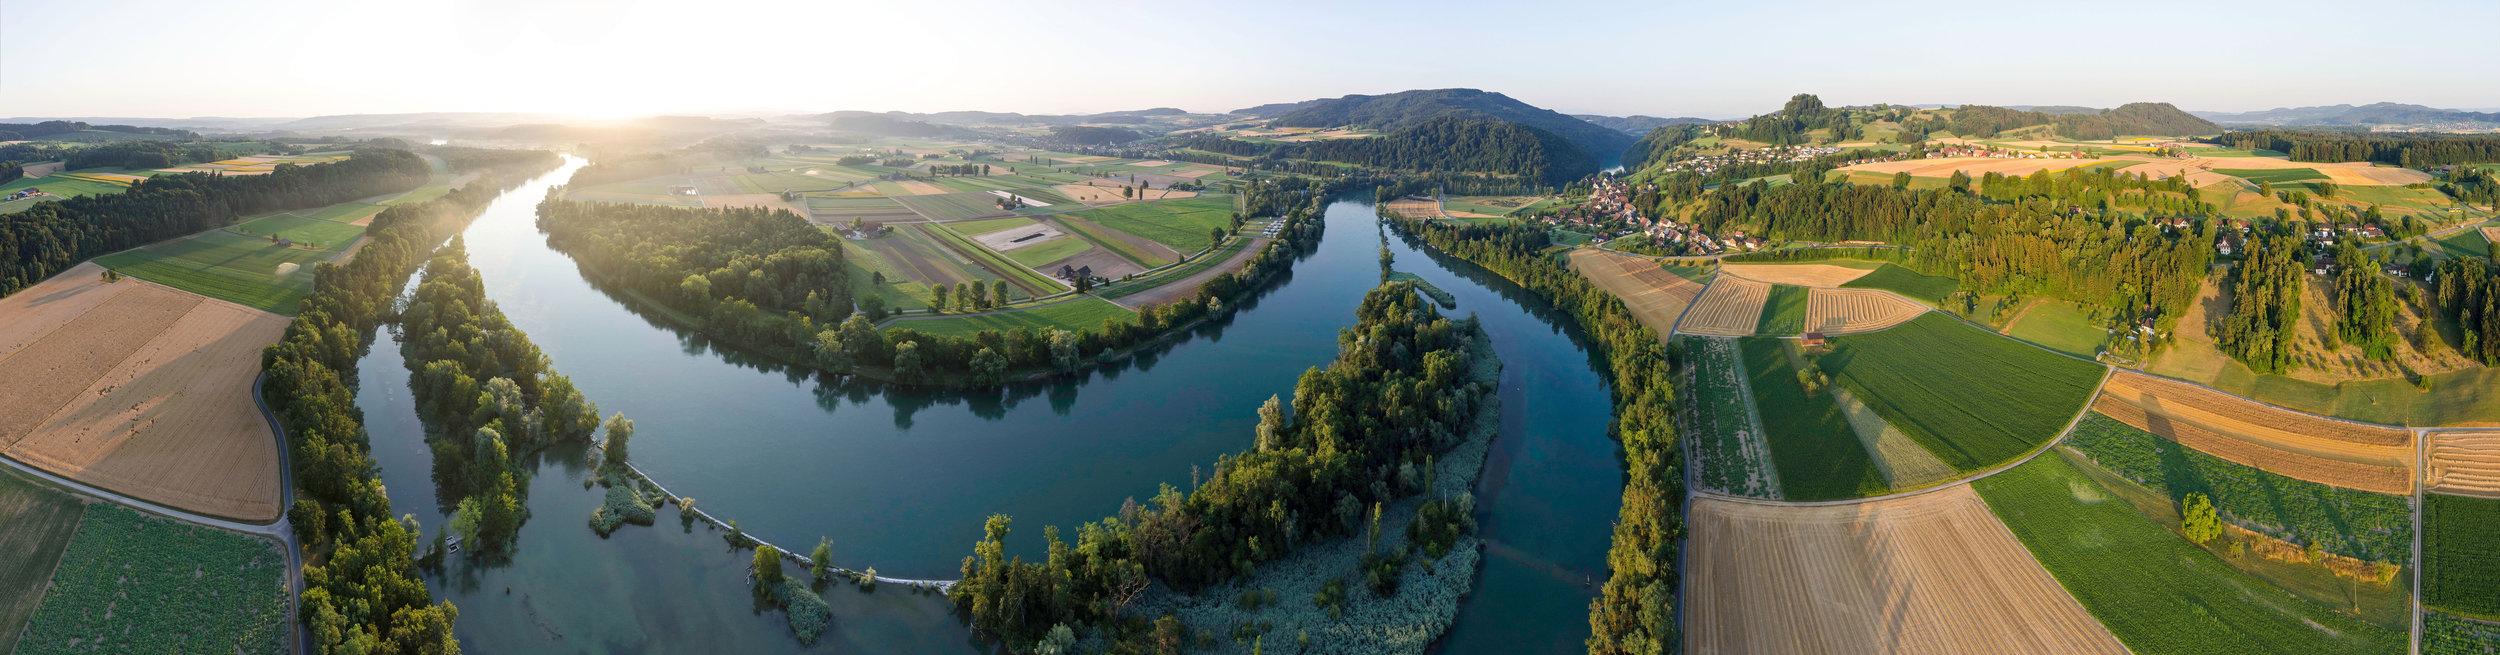 Rhein_Sonnenaufgang.jpg